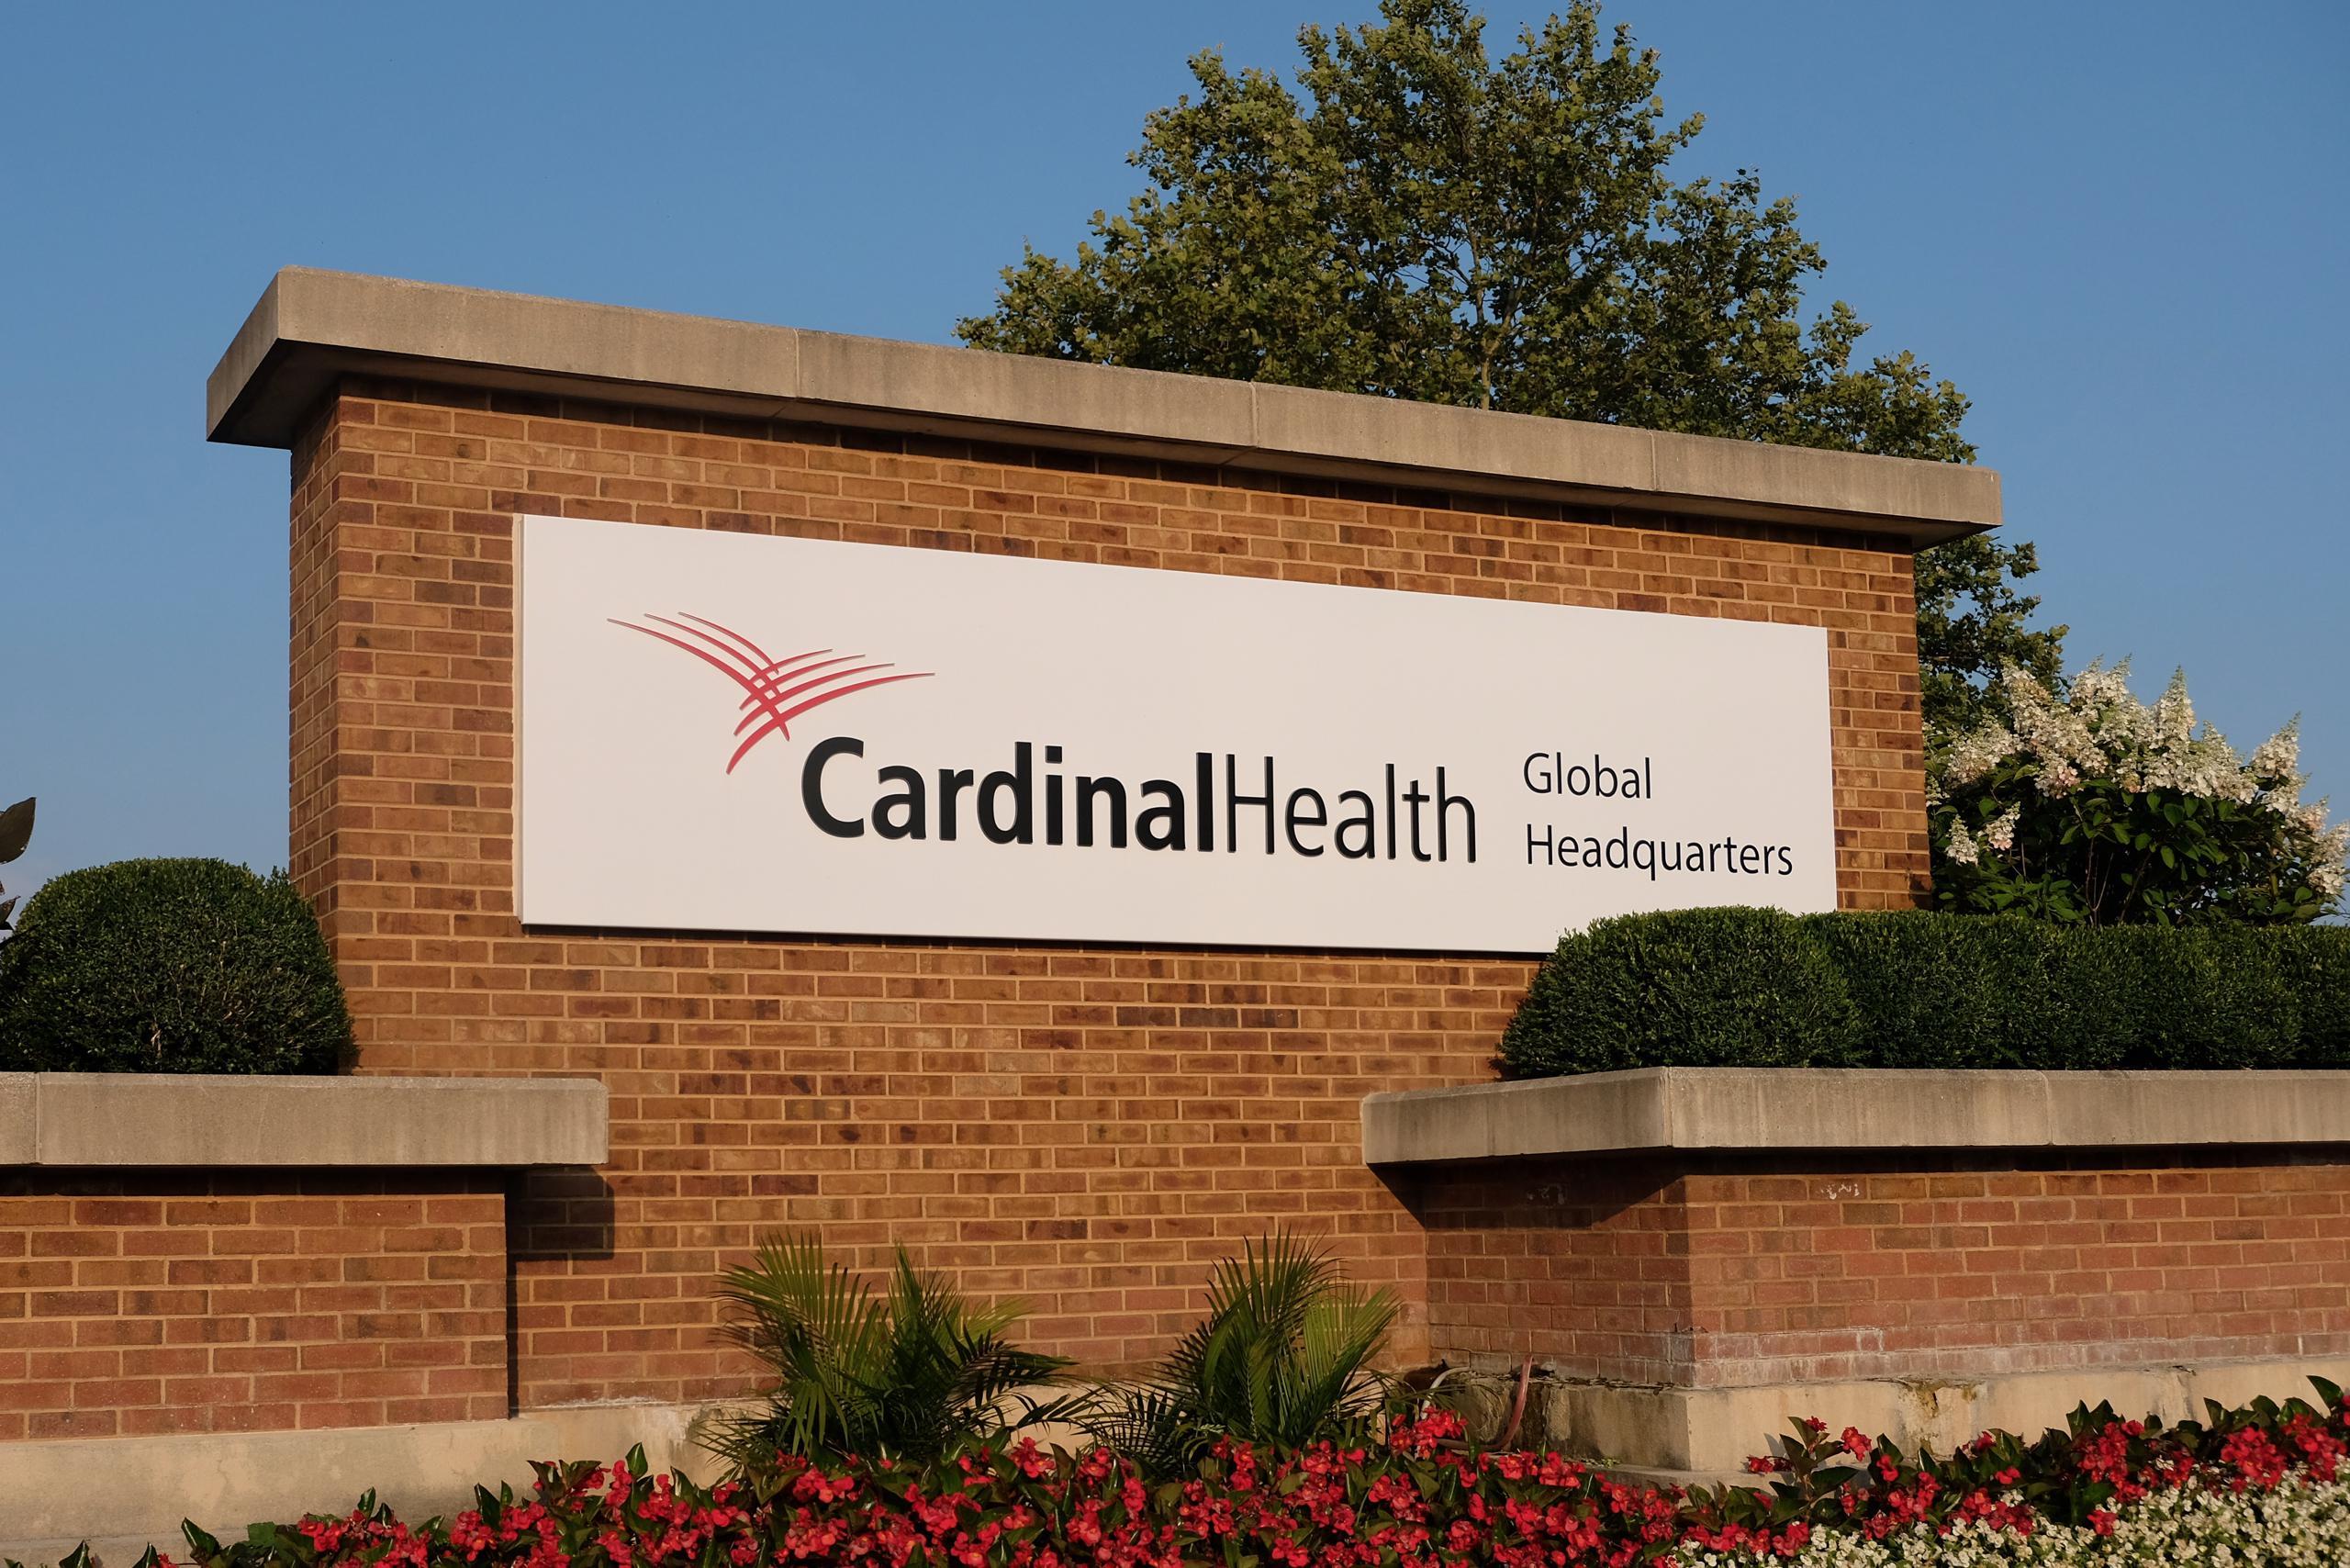 Entrance to Cardinal Health's corporate headquarters in Dublin, Ohio.